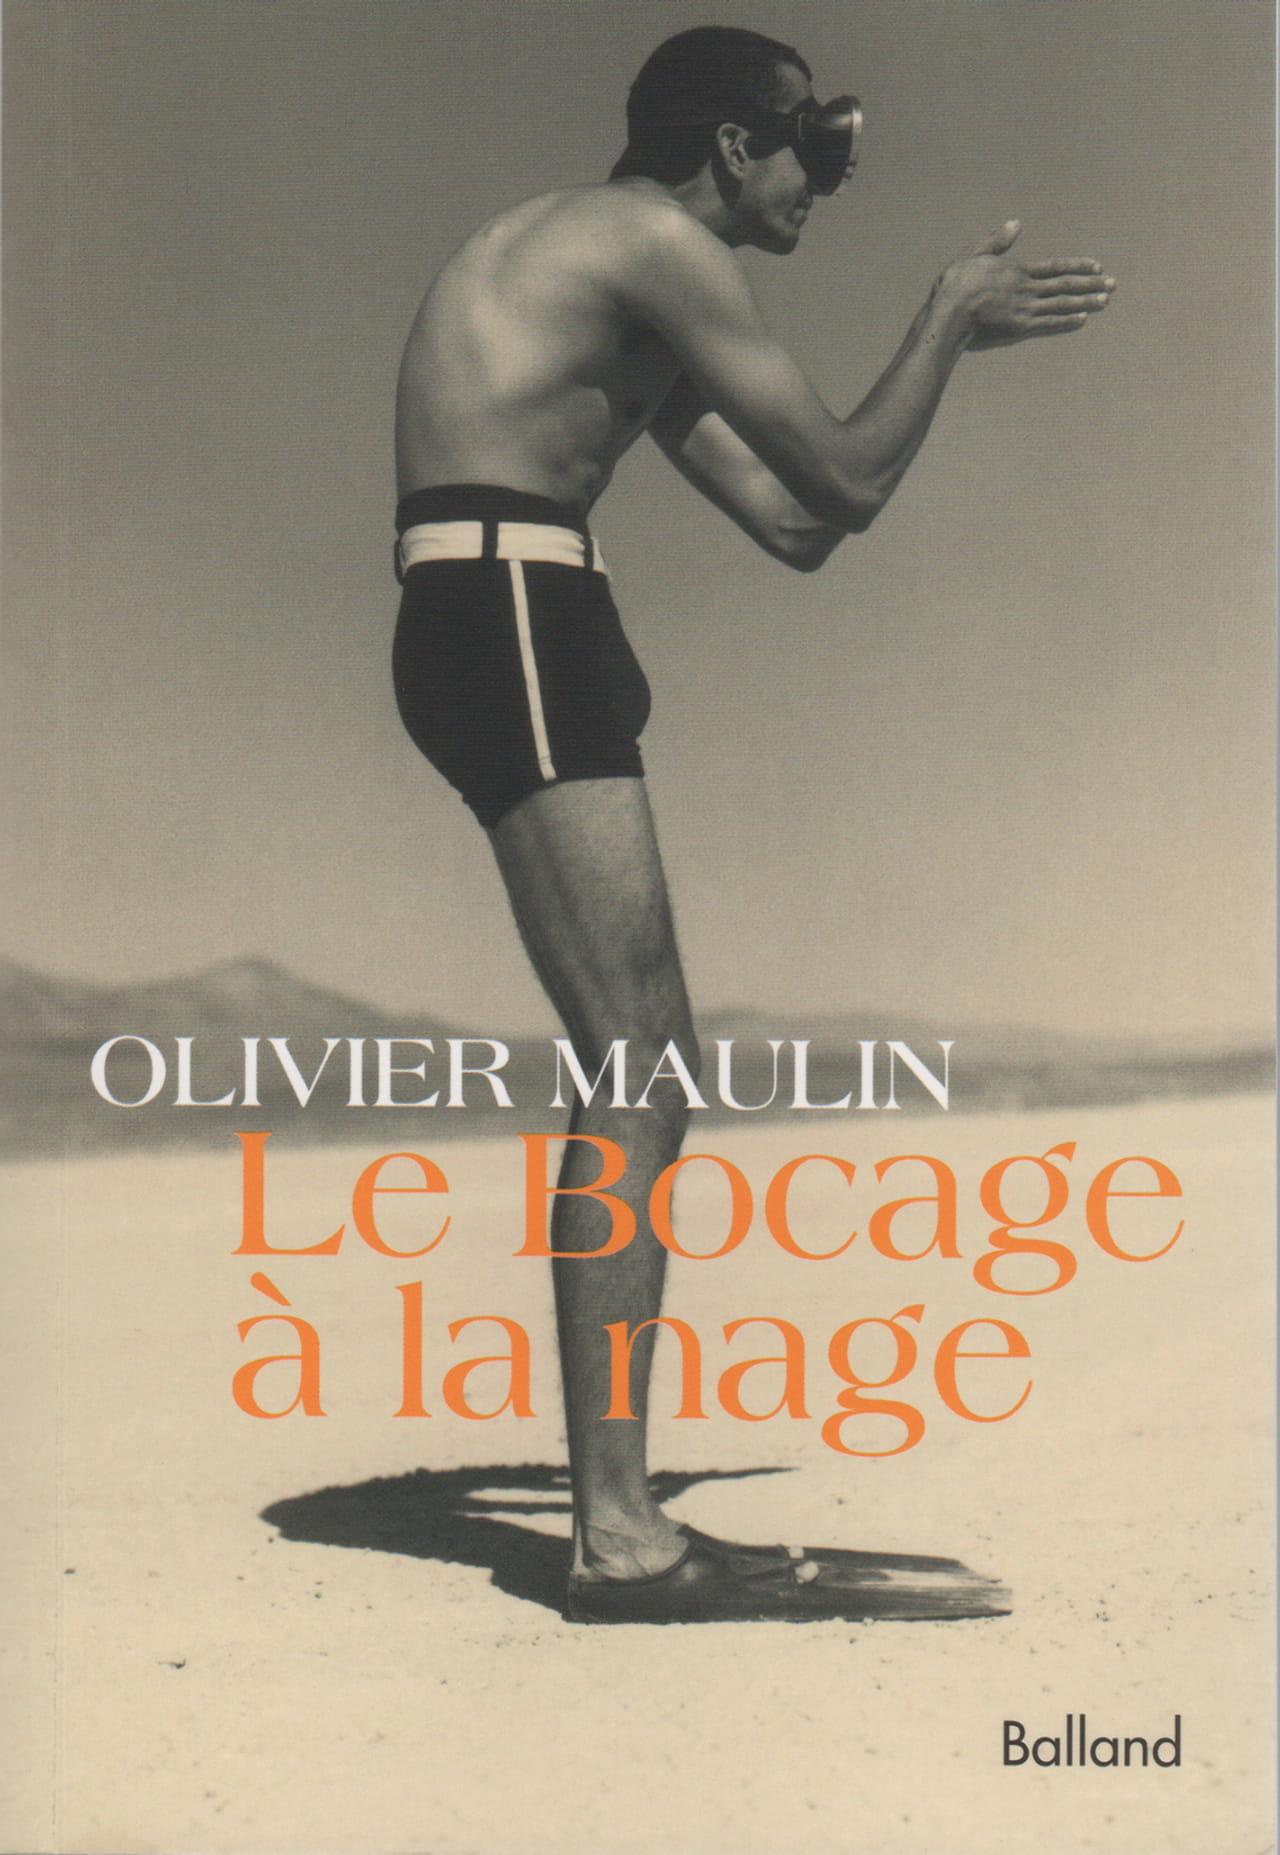 Le bocage à la nage – Olivier Maulin (2015)